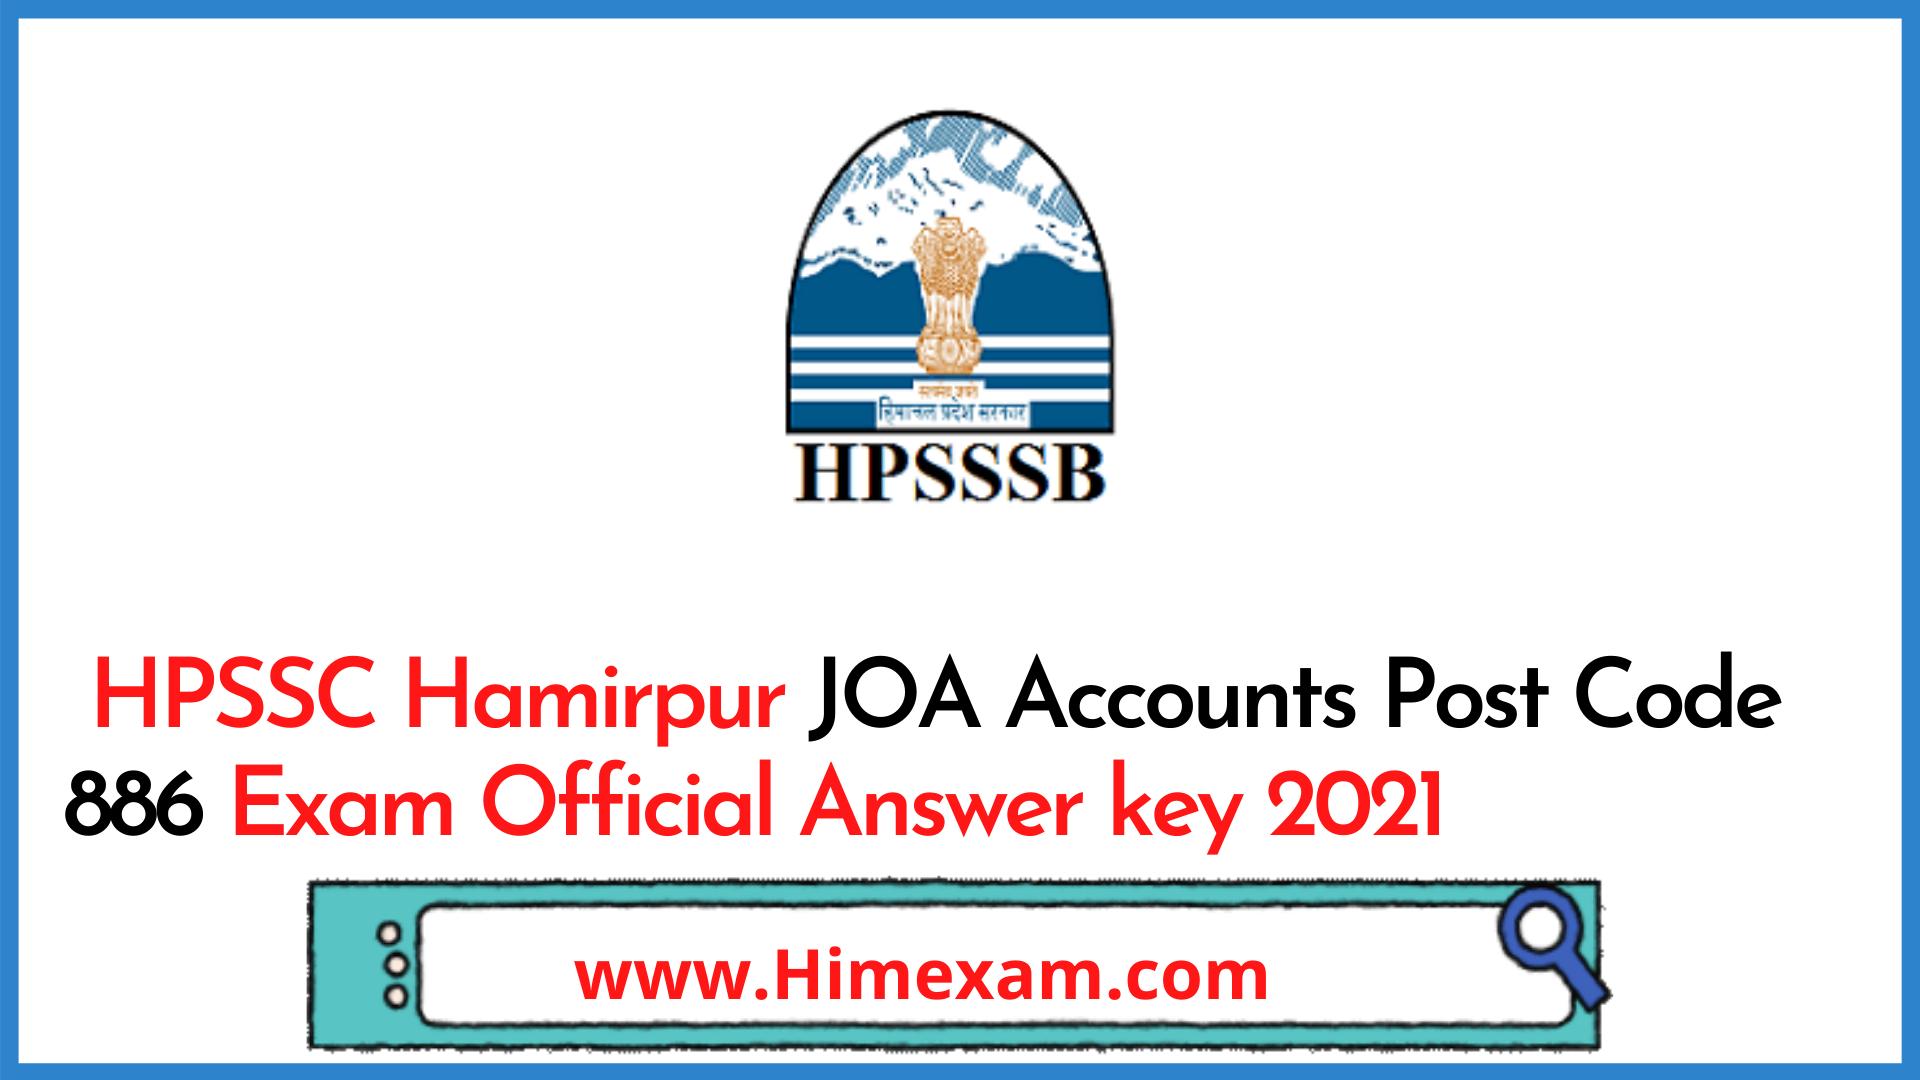 HPSSC Hamirpur JOA Accounts Post Code 886 Exam Official Answer key 2021